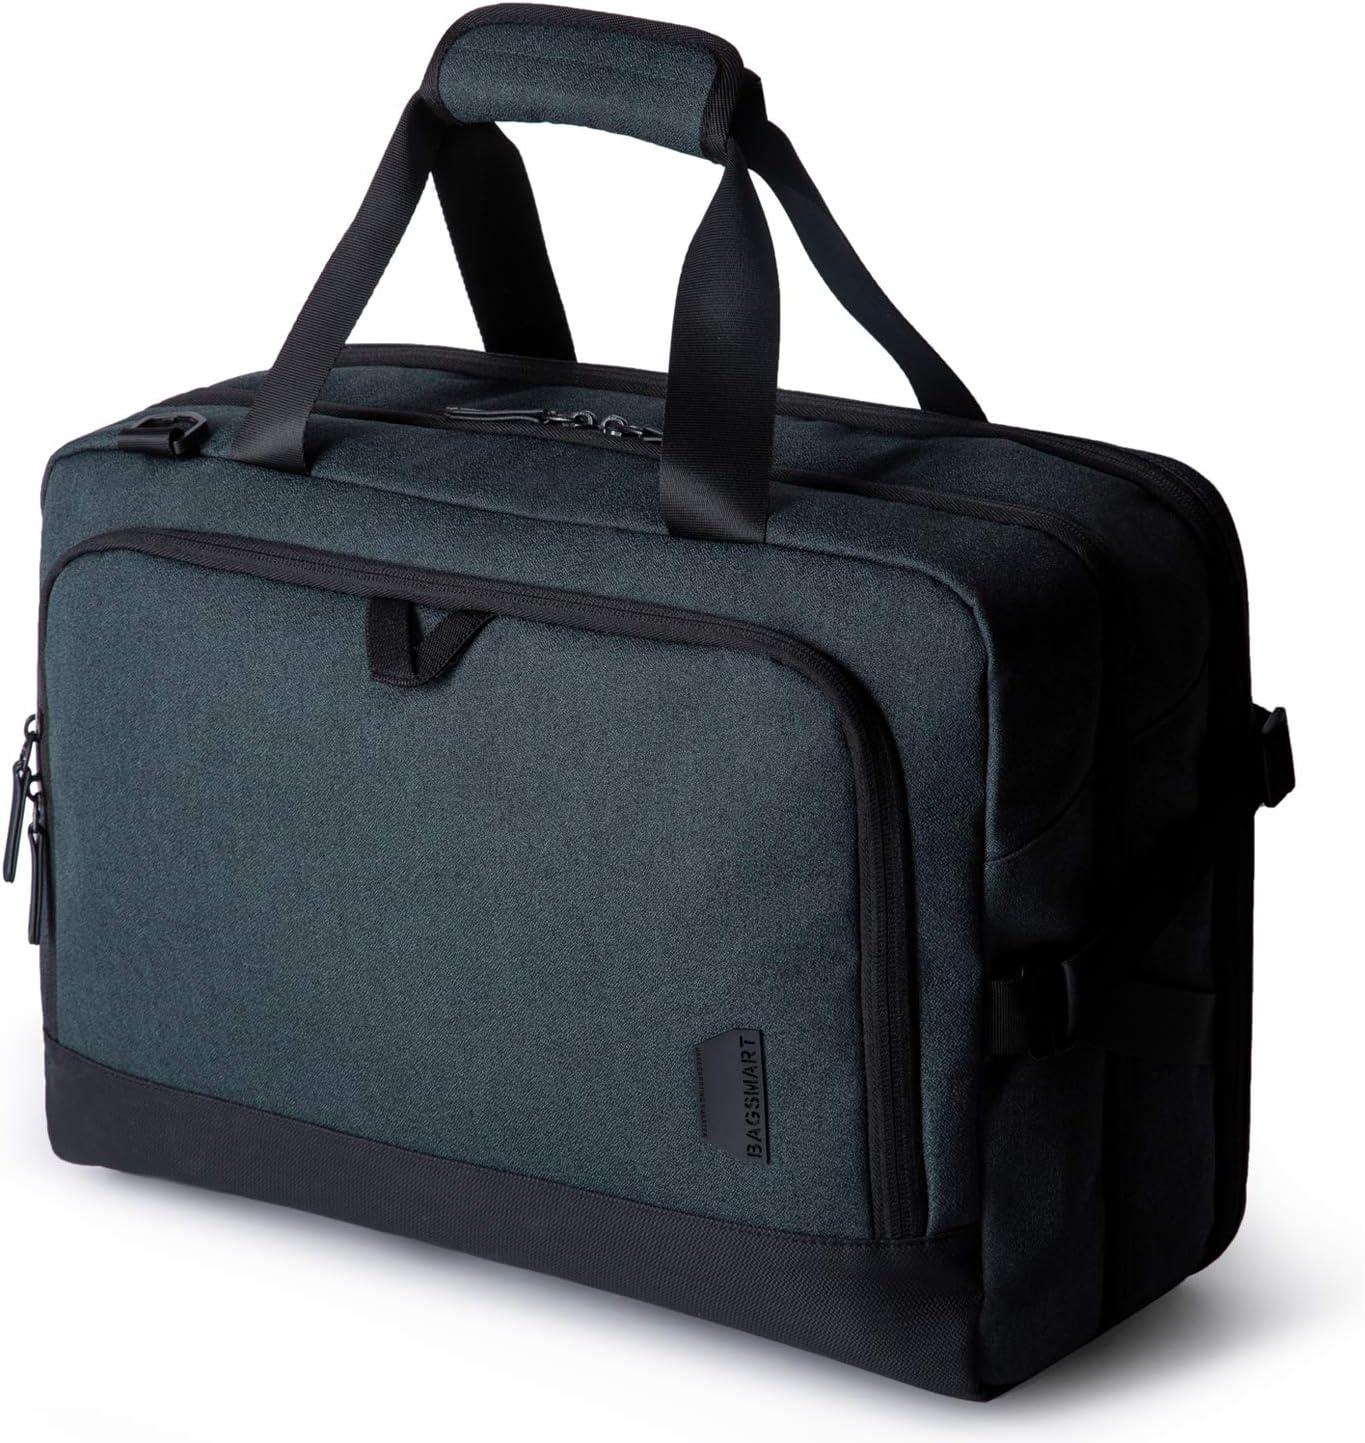 Weekender Bag, BAGSMART Travel Duffle Bag Expandable Overnight Bag Anti-Theft Carry-on Bag with Shoe Bag